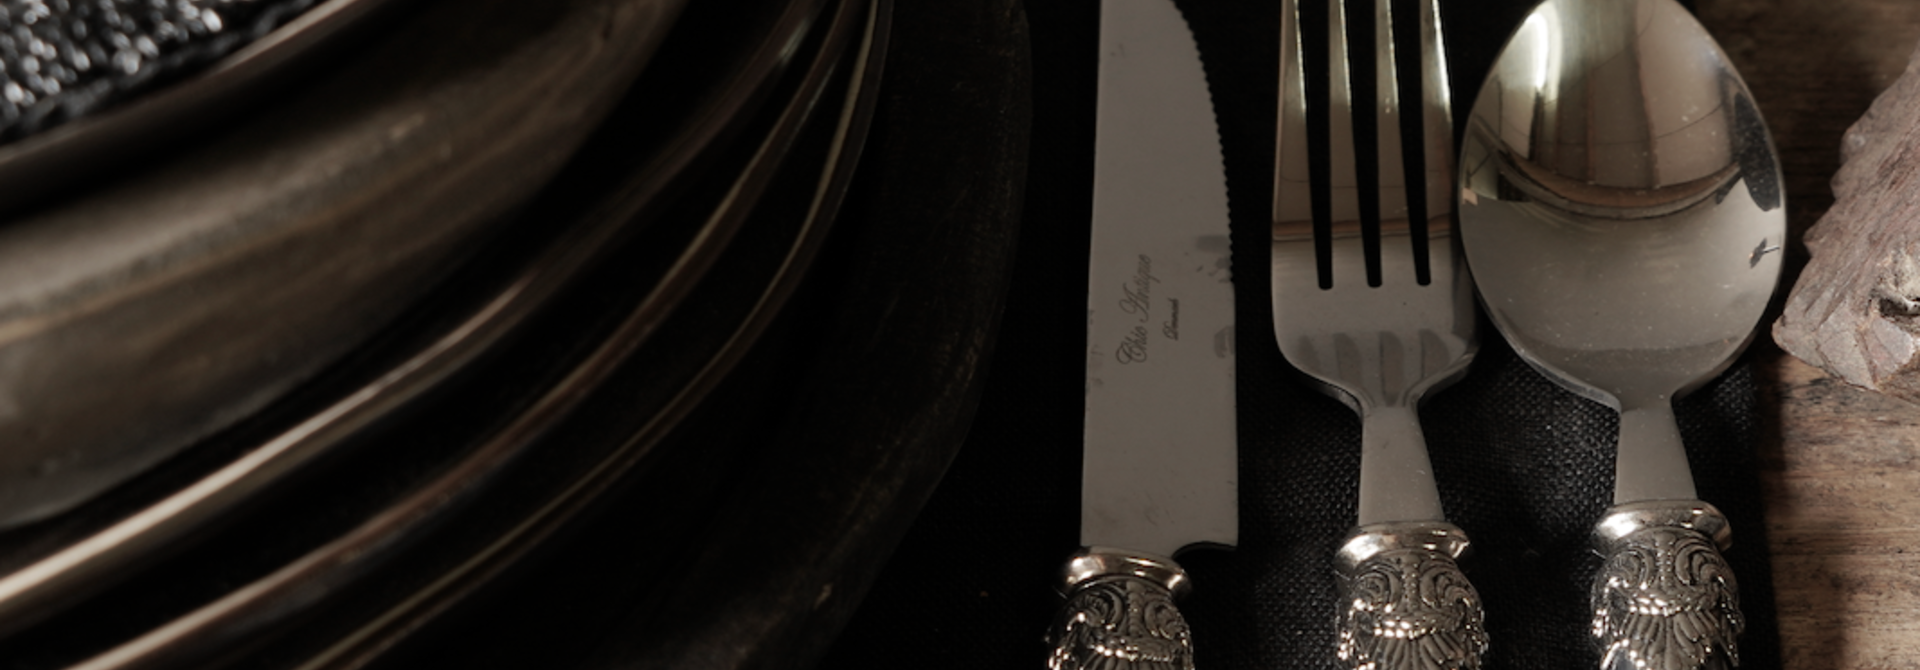 Cutlery 4-piece set vintage design